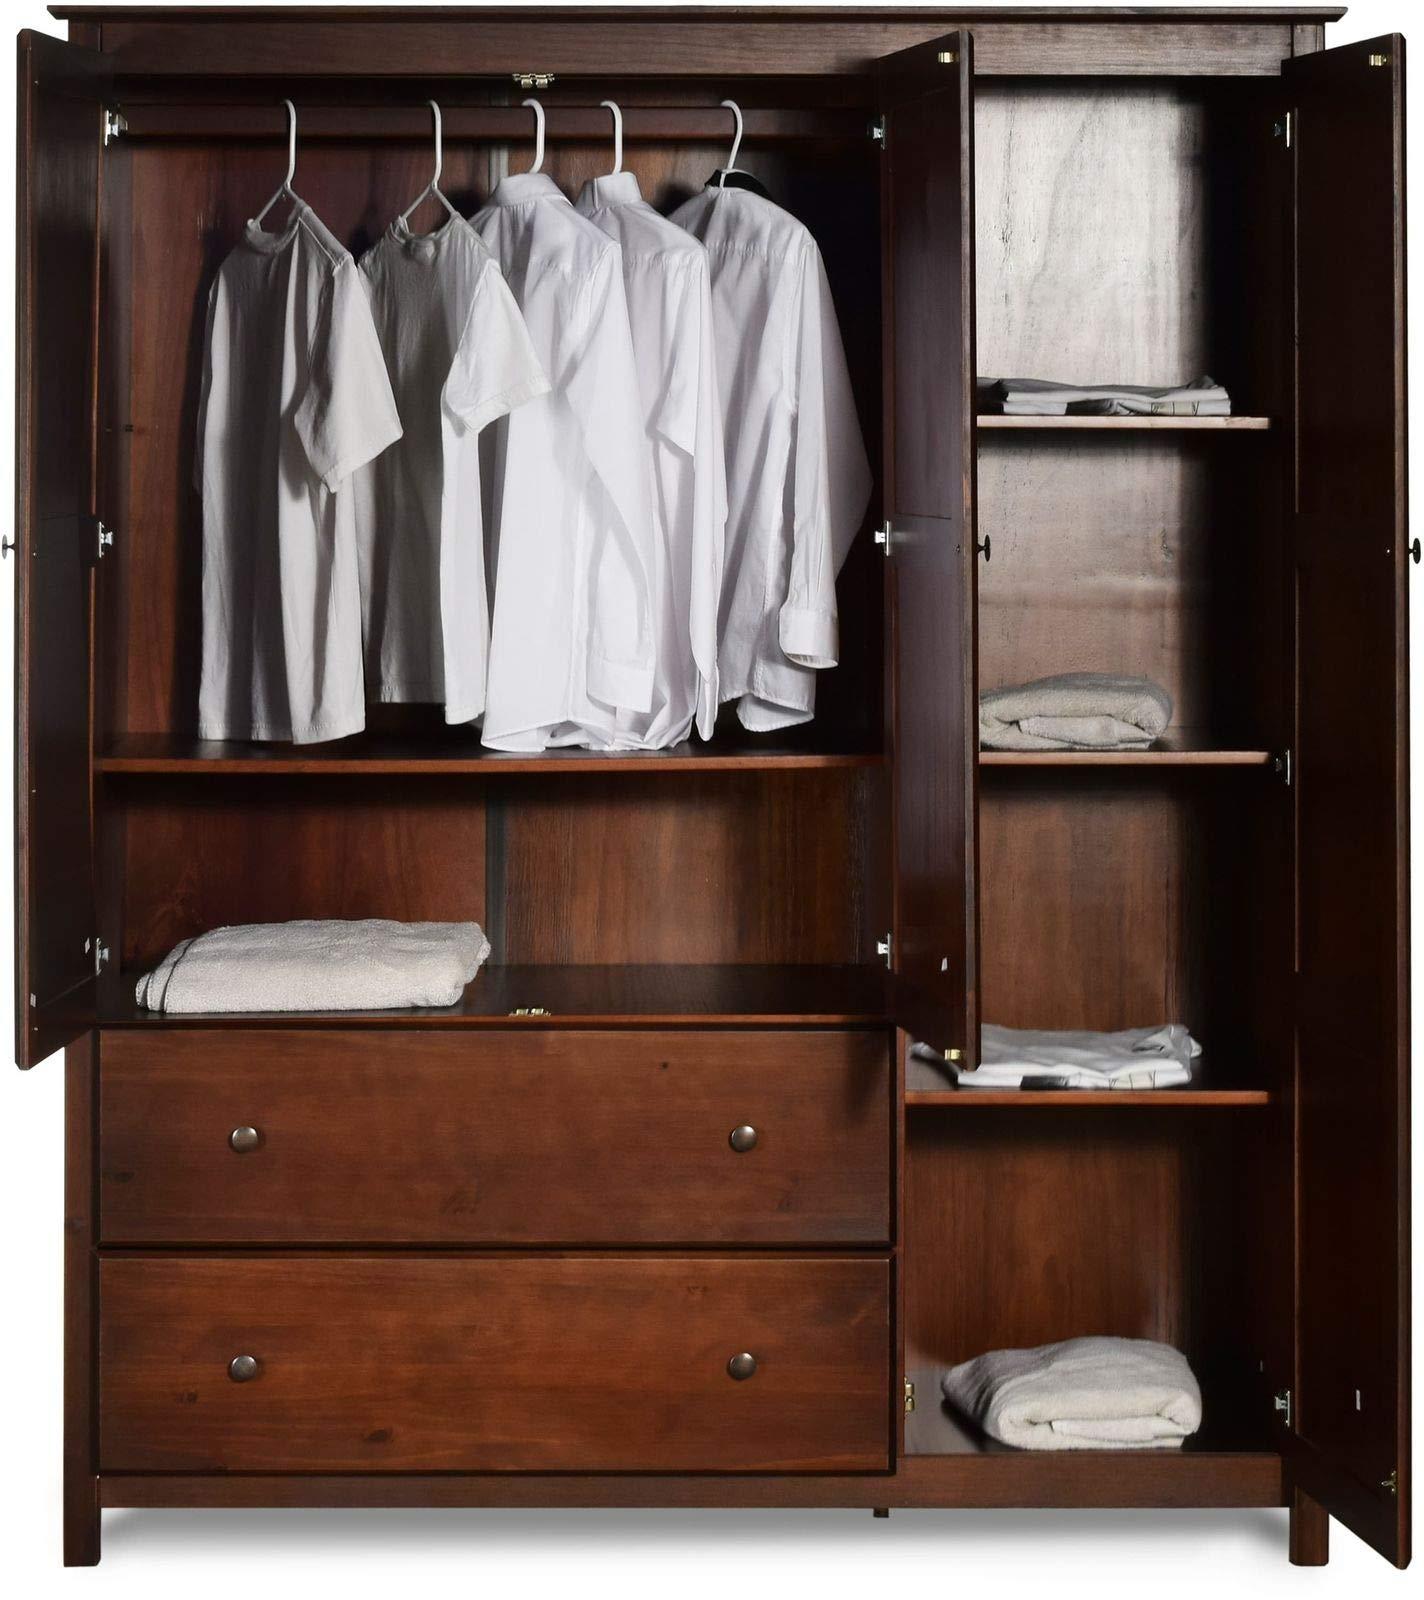 LA&PH 3 Door Armoire Closet Mid-Century Modern Grain Wood Furniture Shaker Cherry Solid Wood by LA&PH